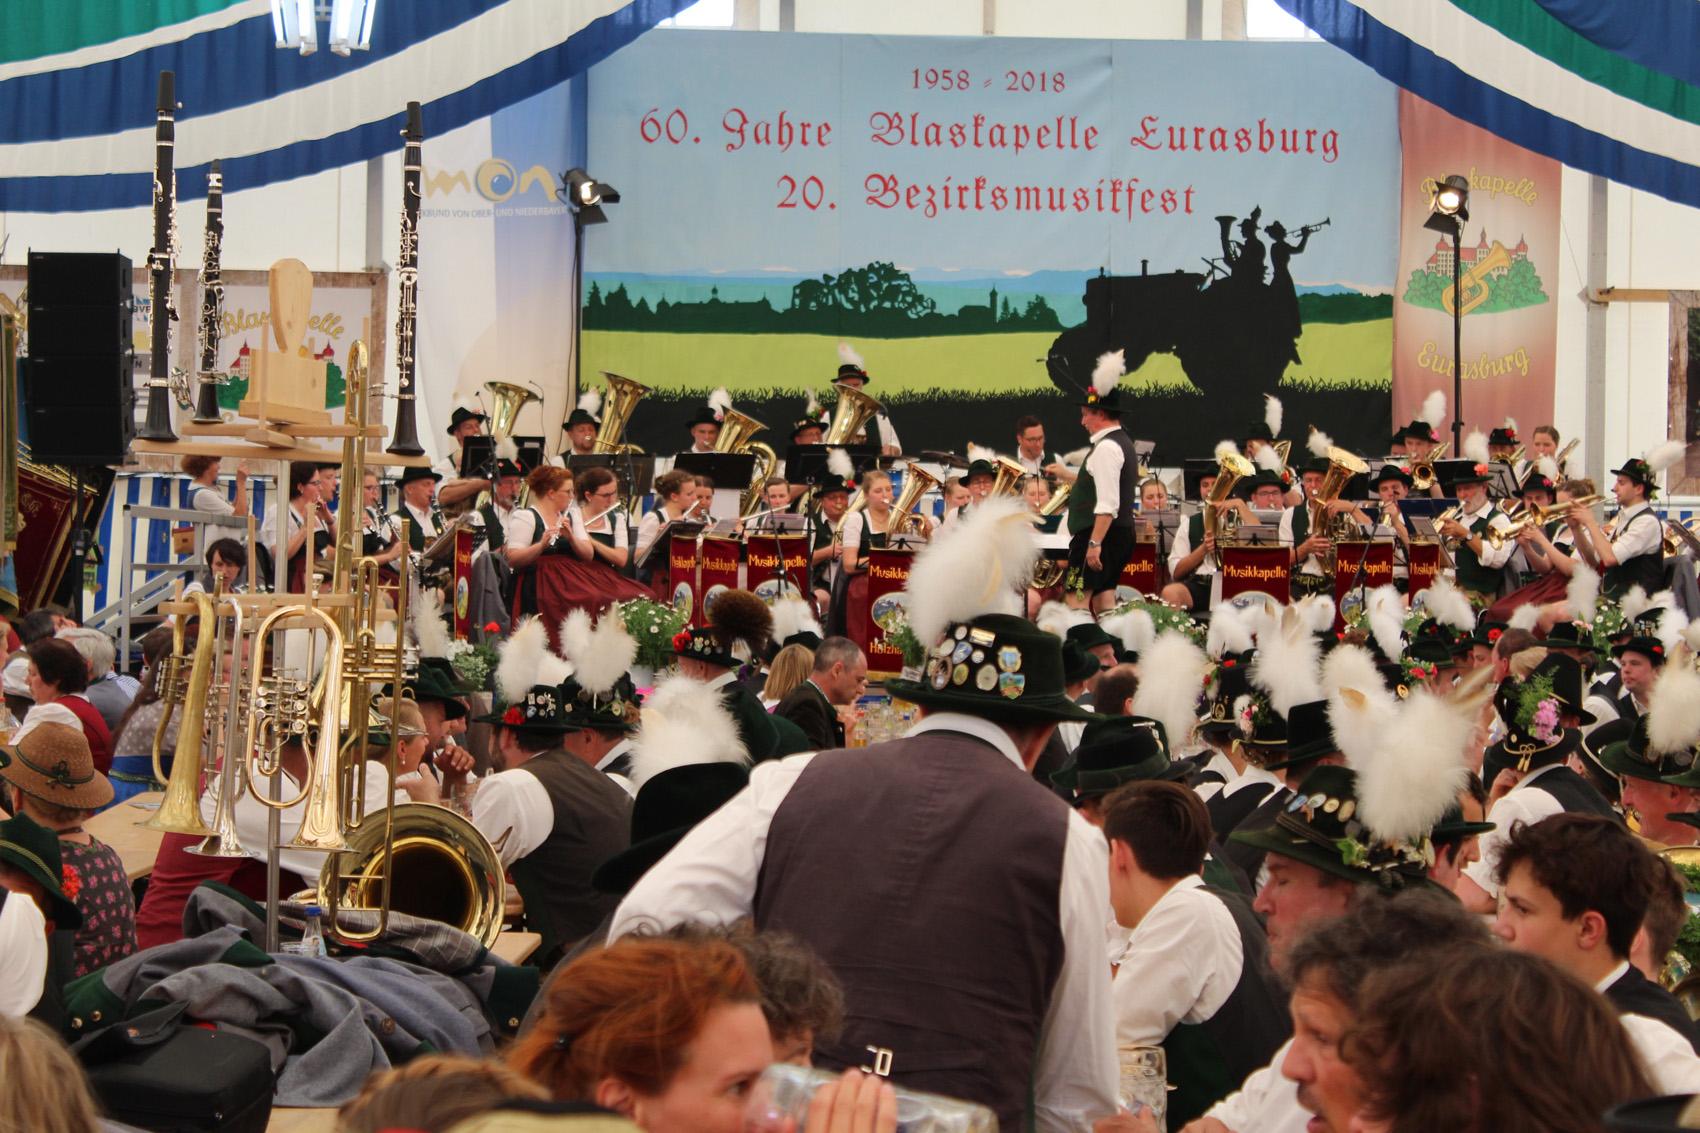 Https: www.dasgelbeblatt.de lokales bad toelz wolfratshausen 2018